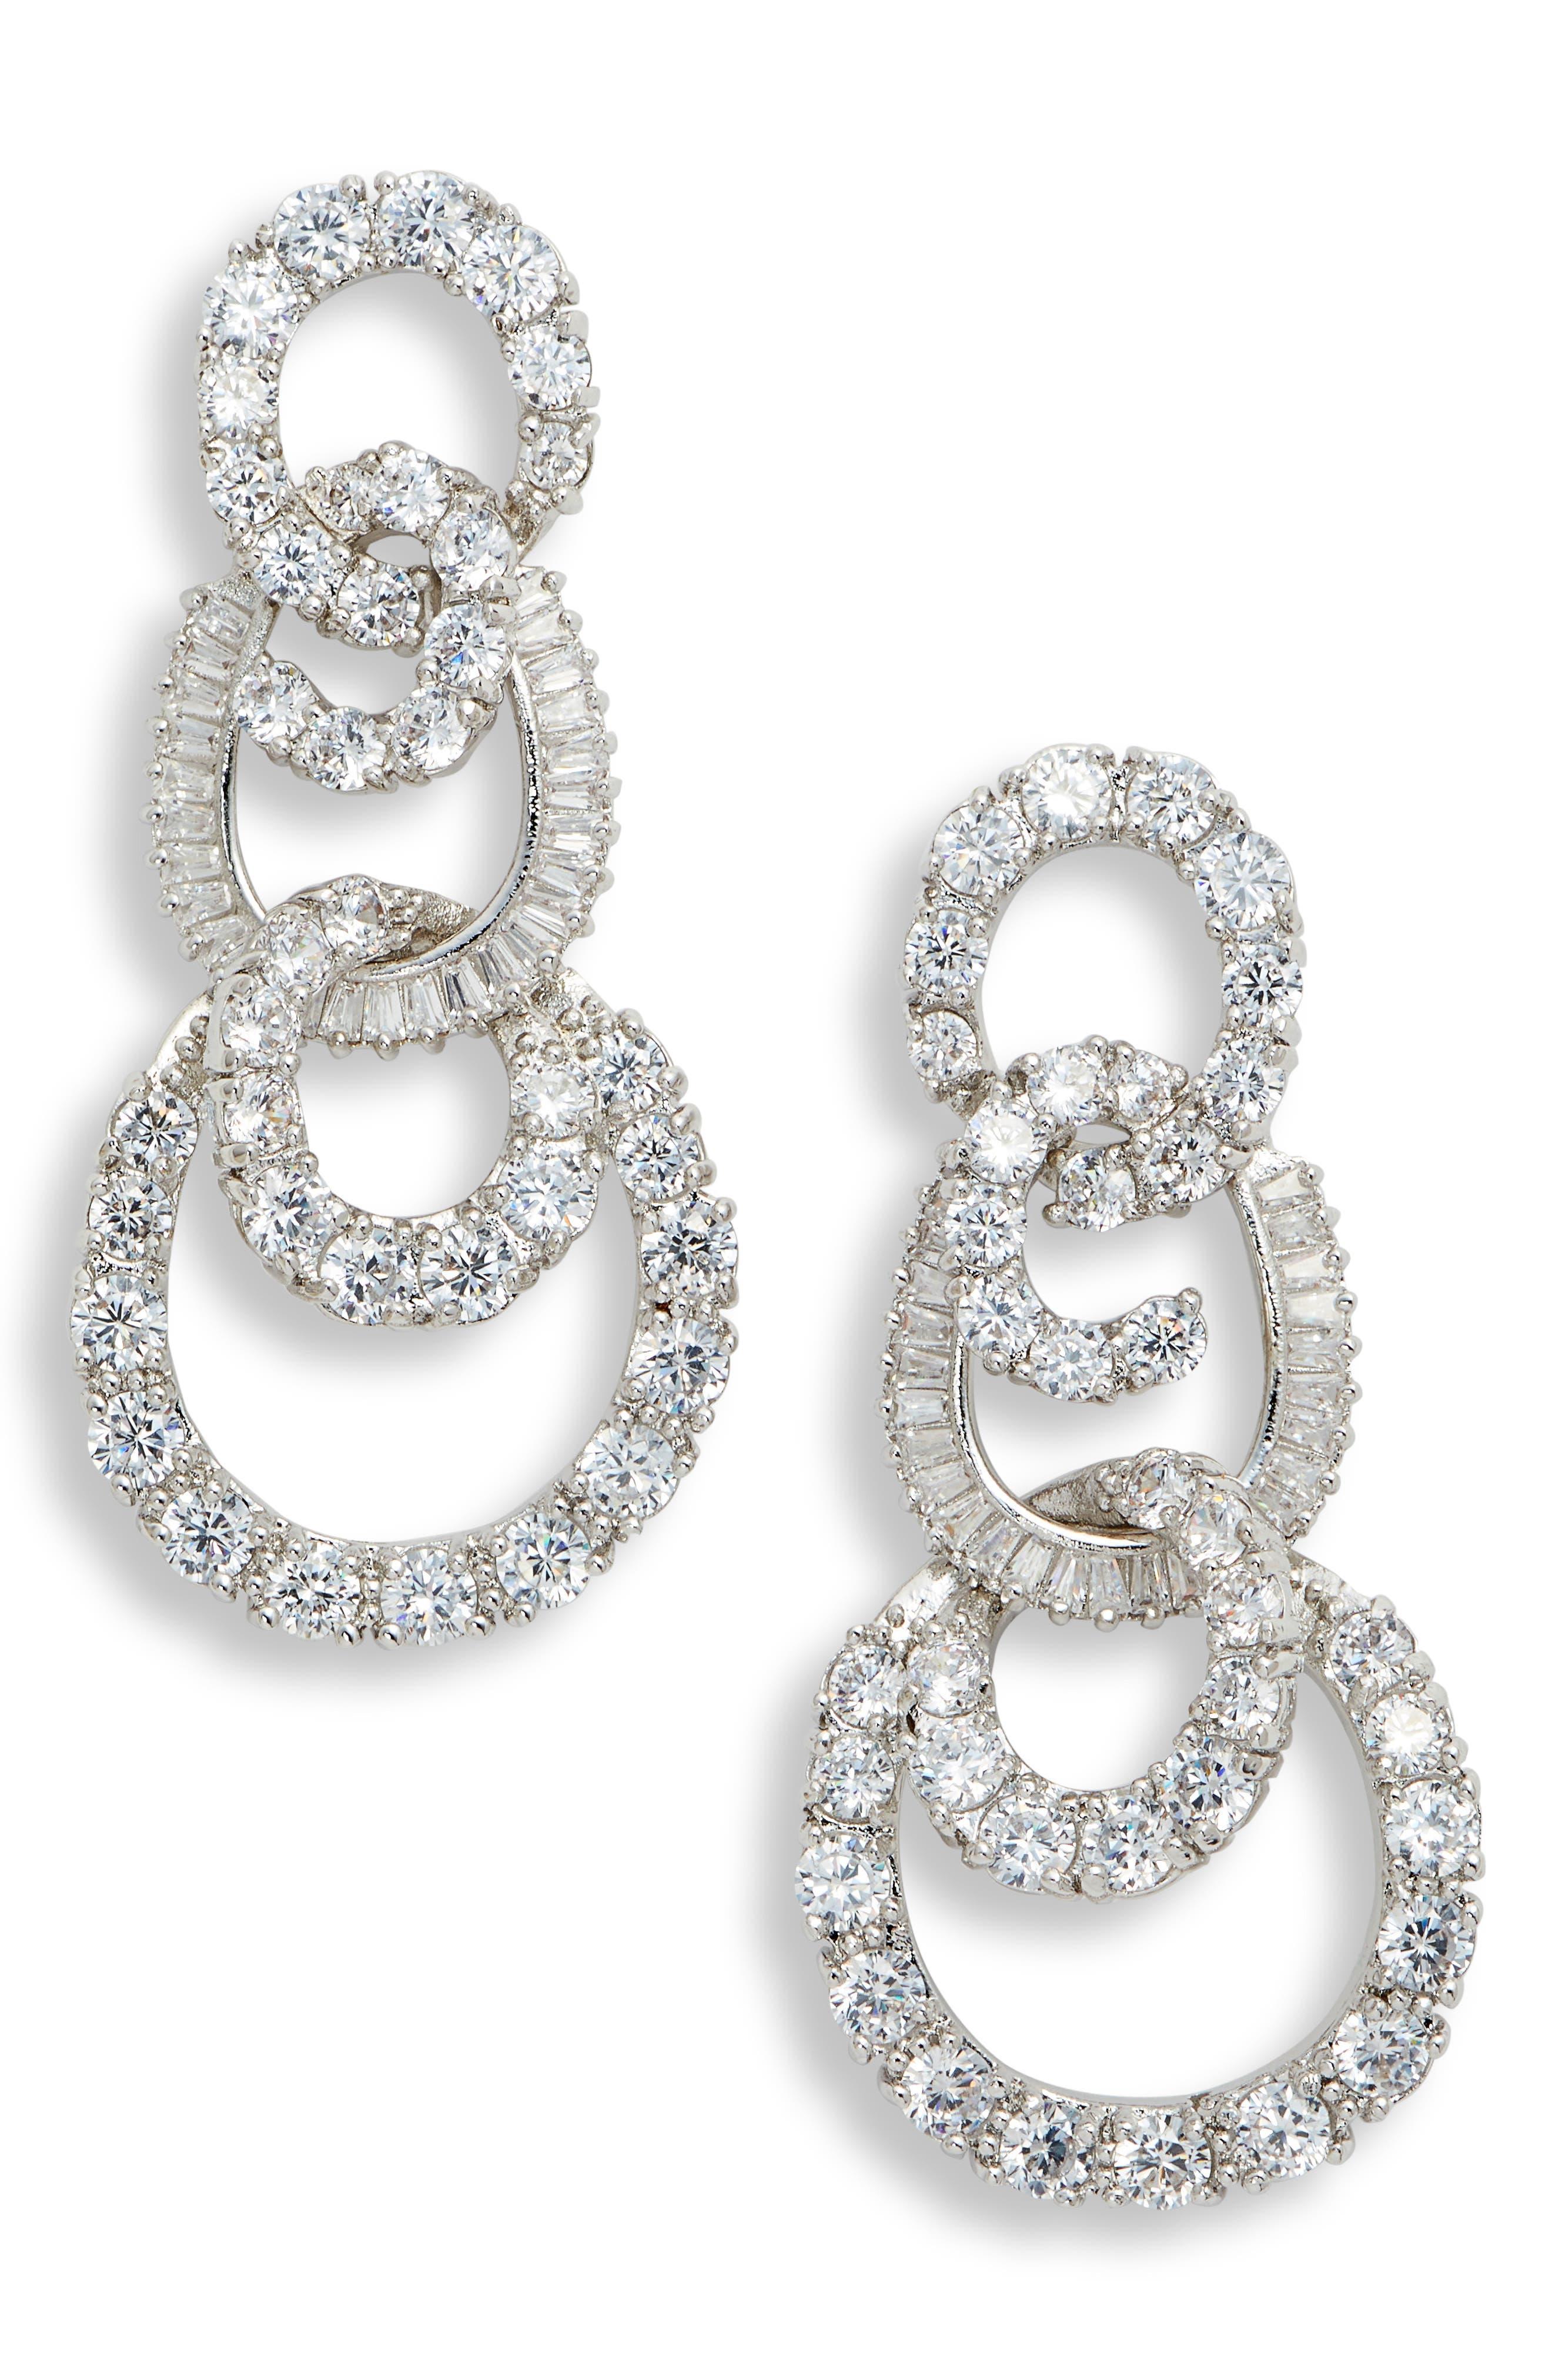 3-Tier Swirl Drop Earrings,                             Main thumbnail 1, color,                             WHITE/ SILVER